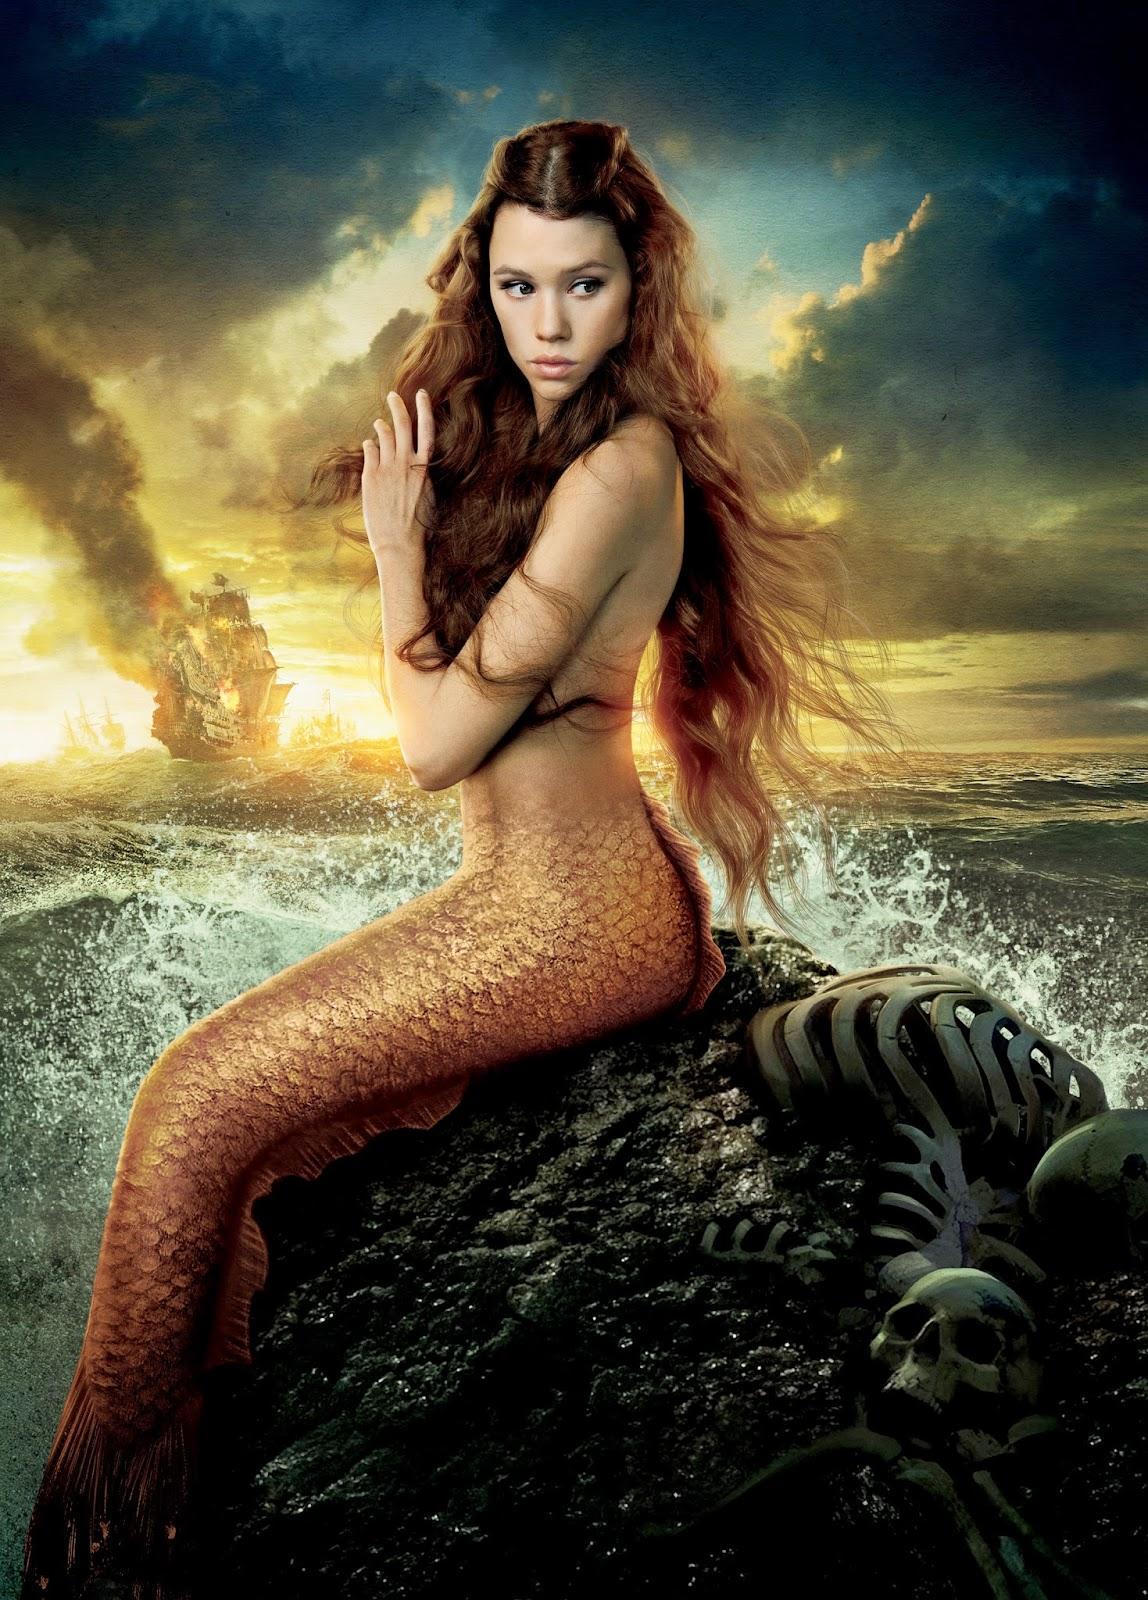 Mermaid Syrena, goddess of the sea